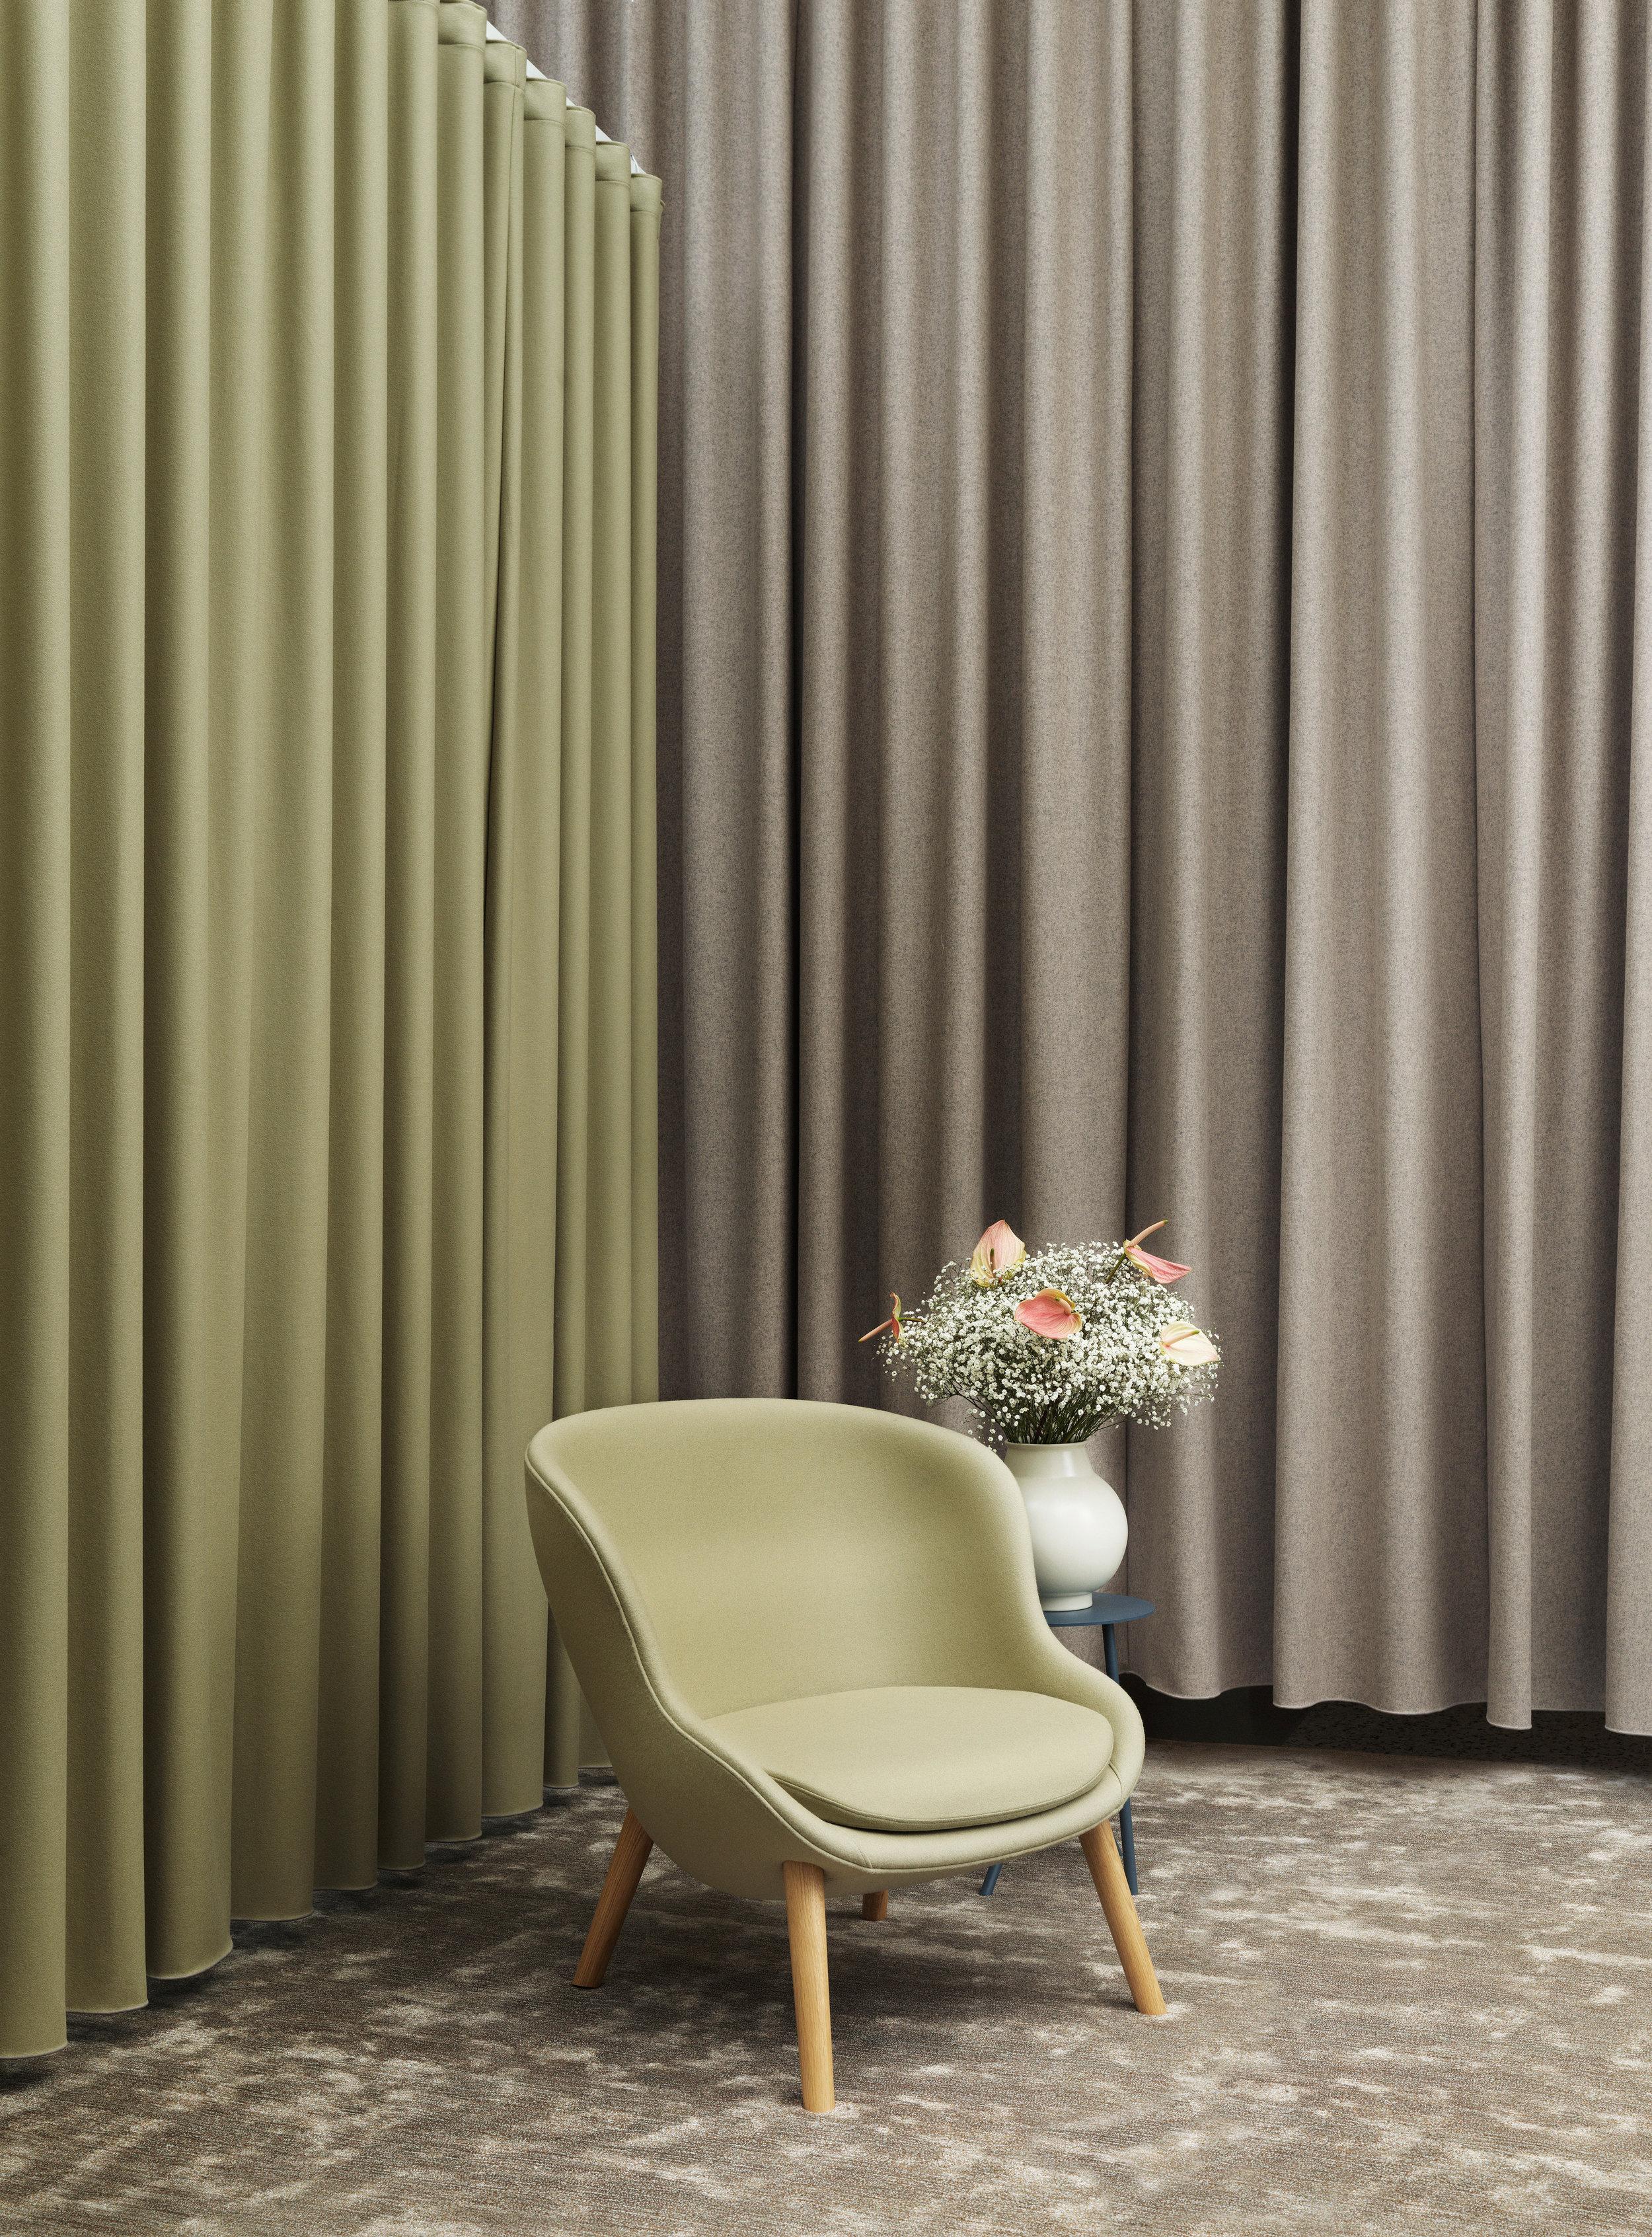 norman-copenhagen-hug-lounge-chair-living-scandinavian-home.jpg